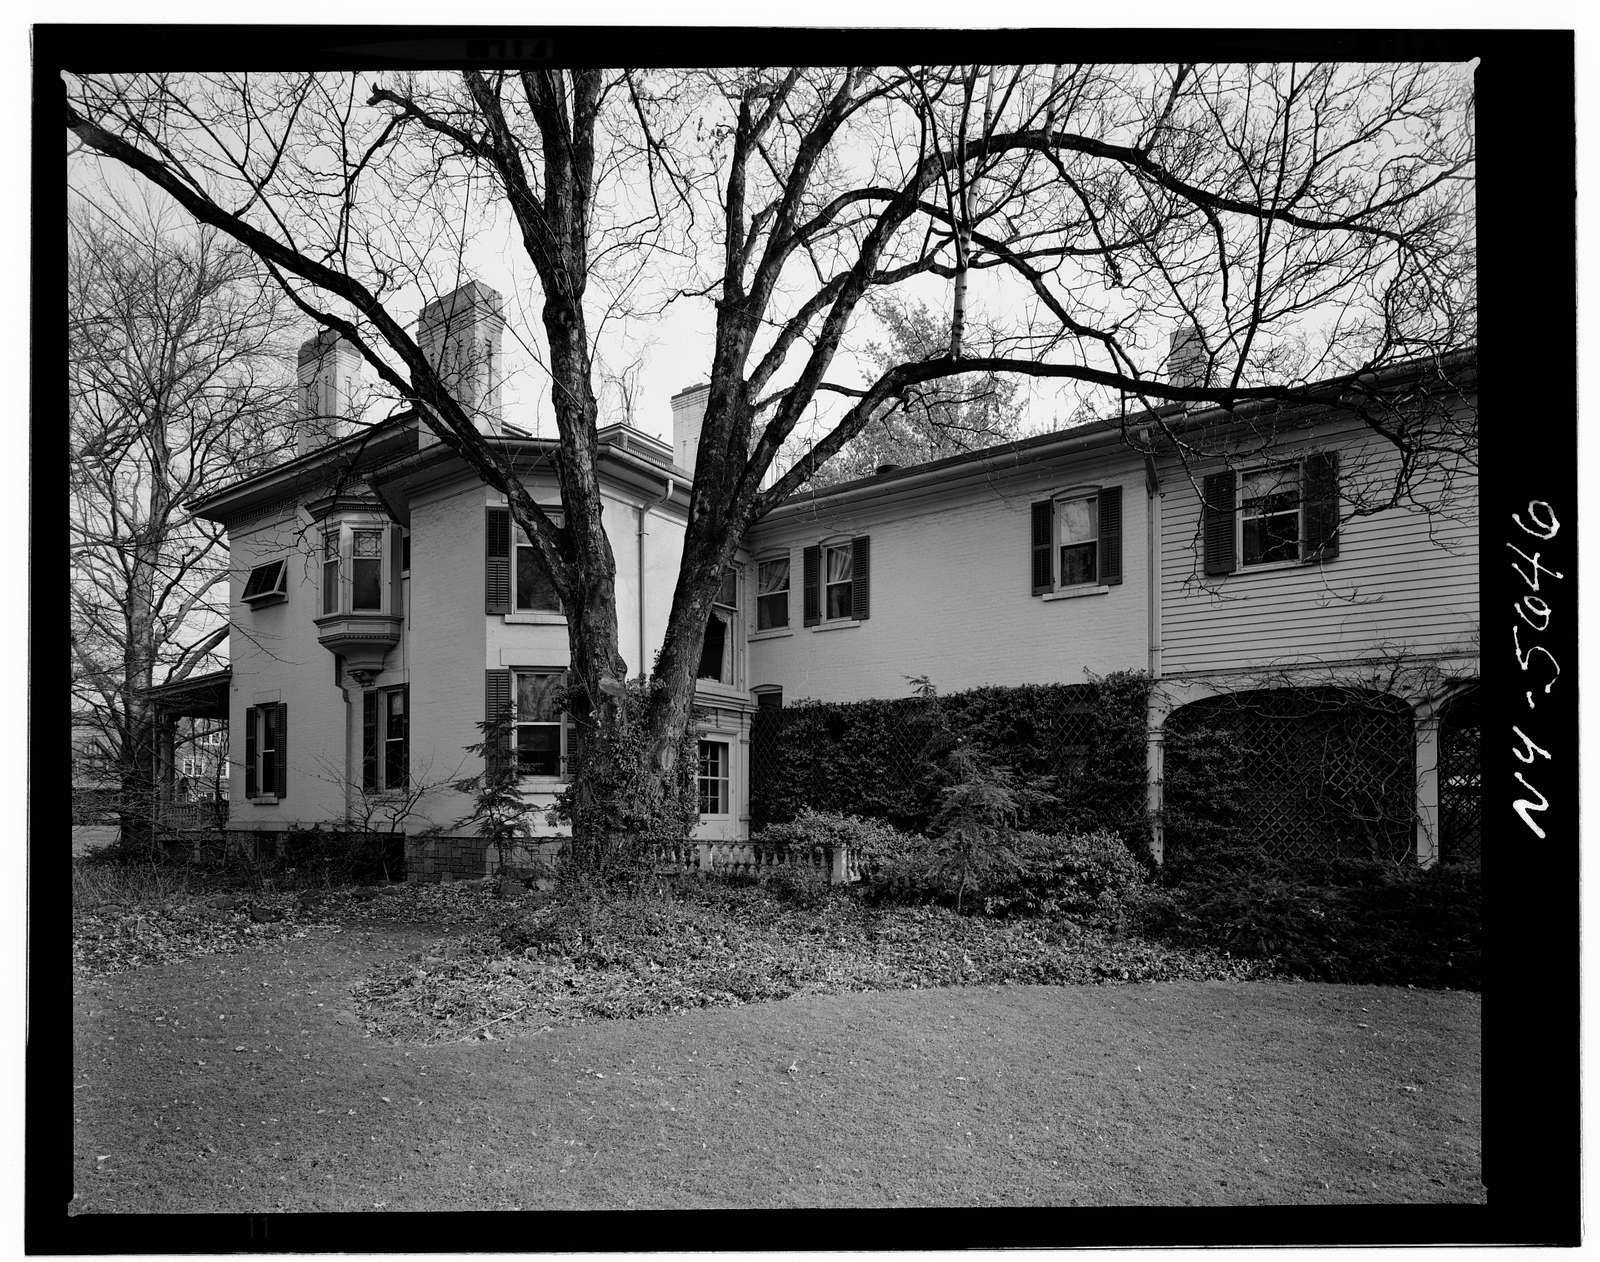 Harris-Hollister-Spencer House, 1005 East Avenue, Rochester, Monroe County, NY